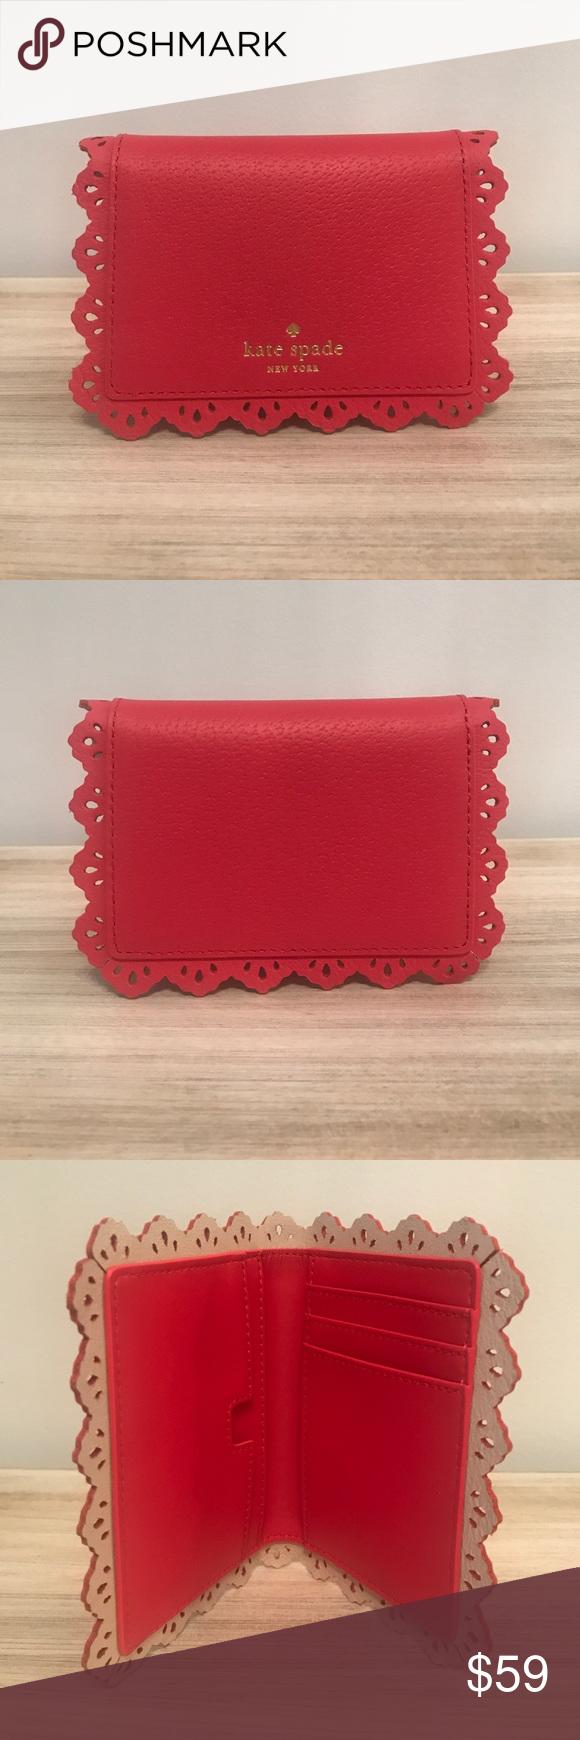 "Kate Spade Cecelia Fordham Court Card Case Wallet NEW WITH TAGS Kate Spade Cecelia Fordham Court Card Case Wallet in Geranium Pumice! 5.25"" W, 3.5"" H kate spade Bags Wallets"